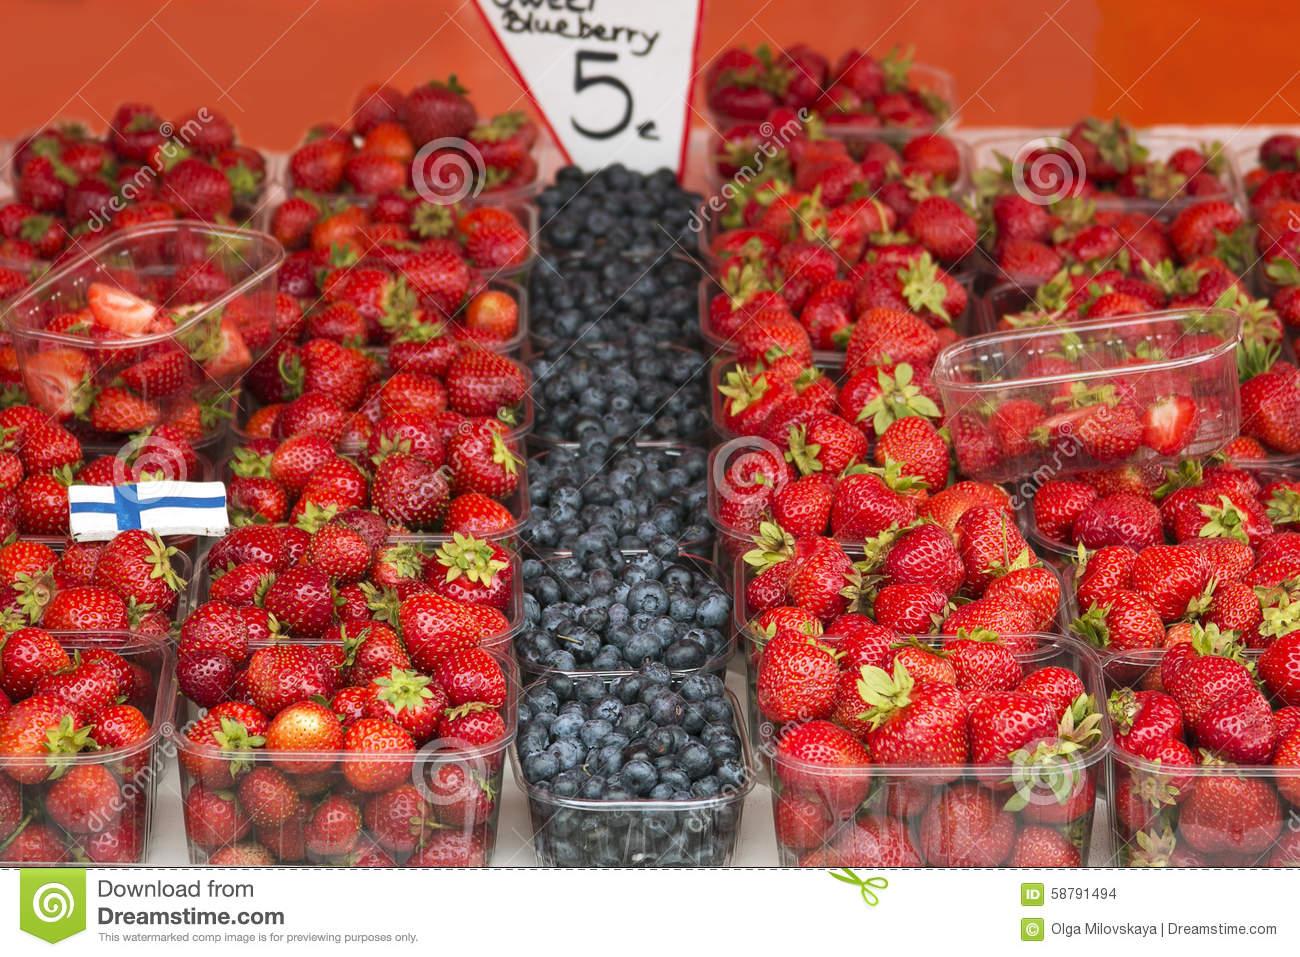 Marketplace With Garden Truck, Vegetables, Fruits, Berries Etc.